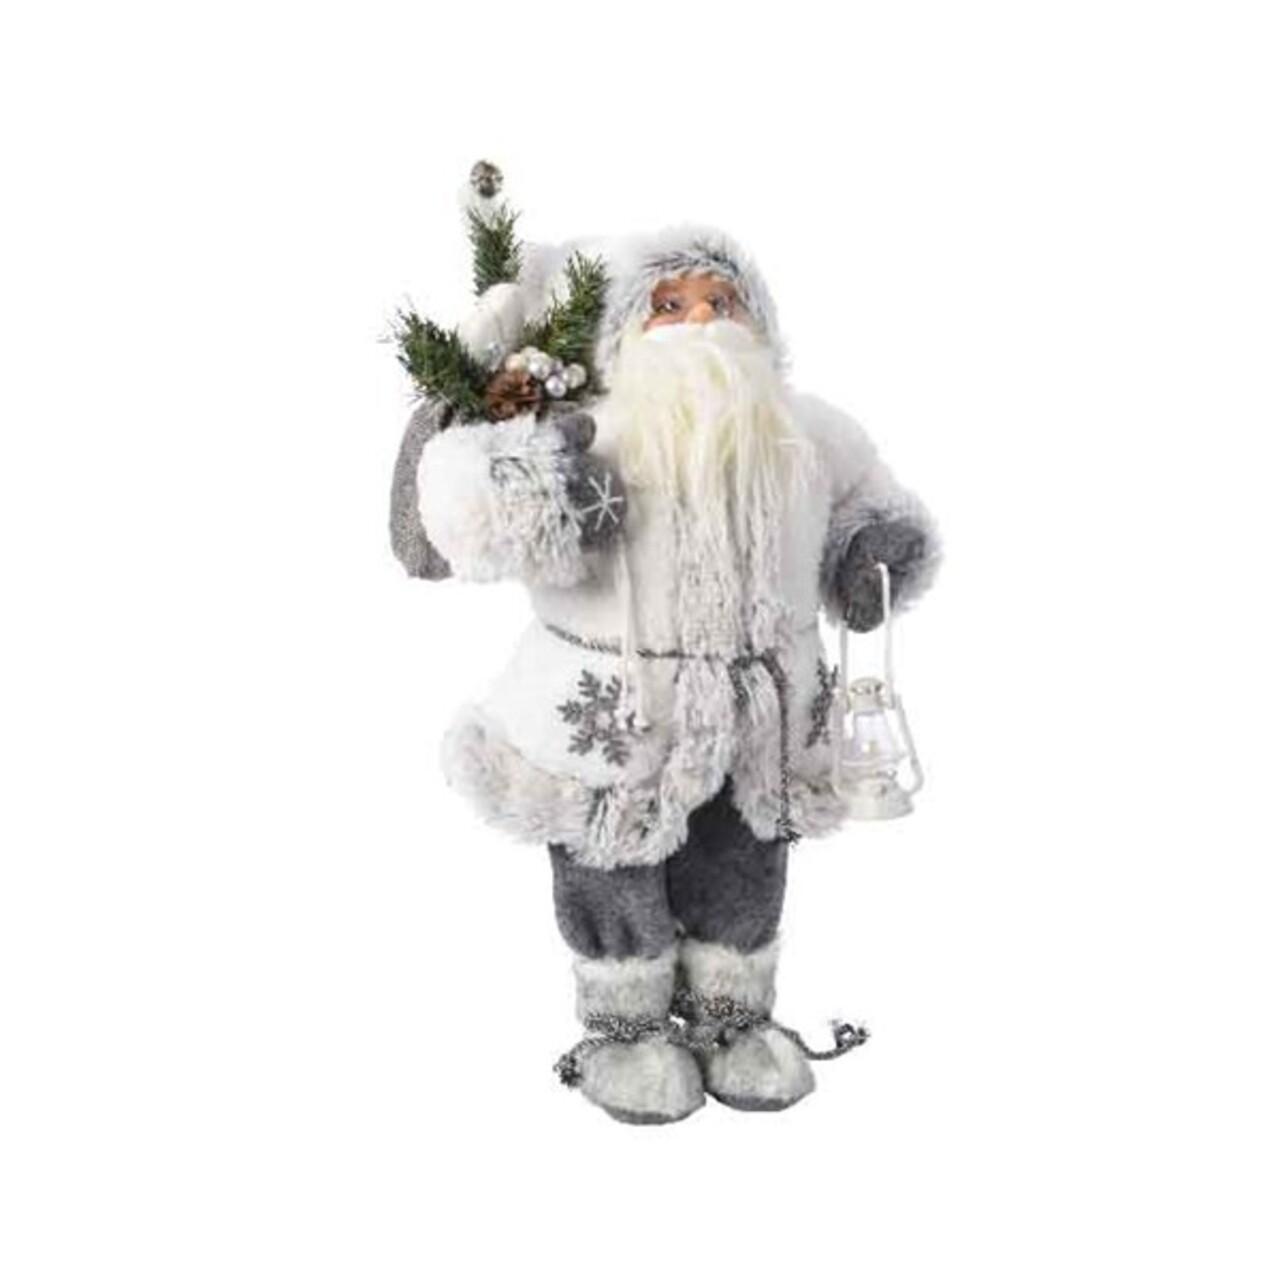 Decoratiune Santa w snowflake, Decoris, H30 cm, poliester, alb